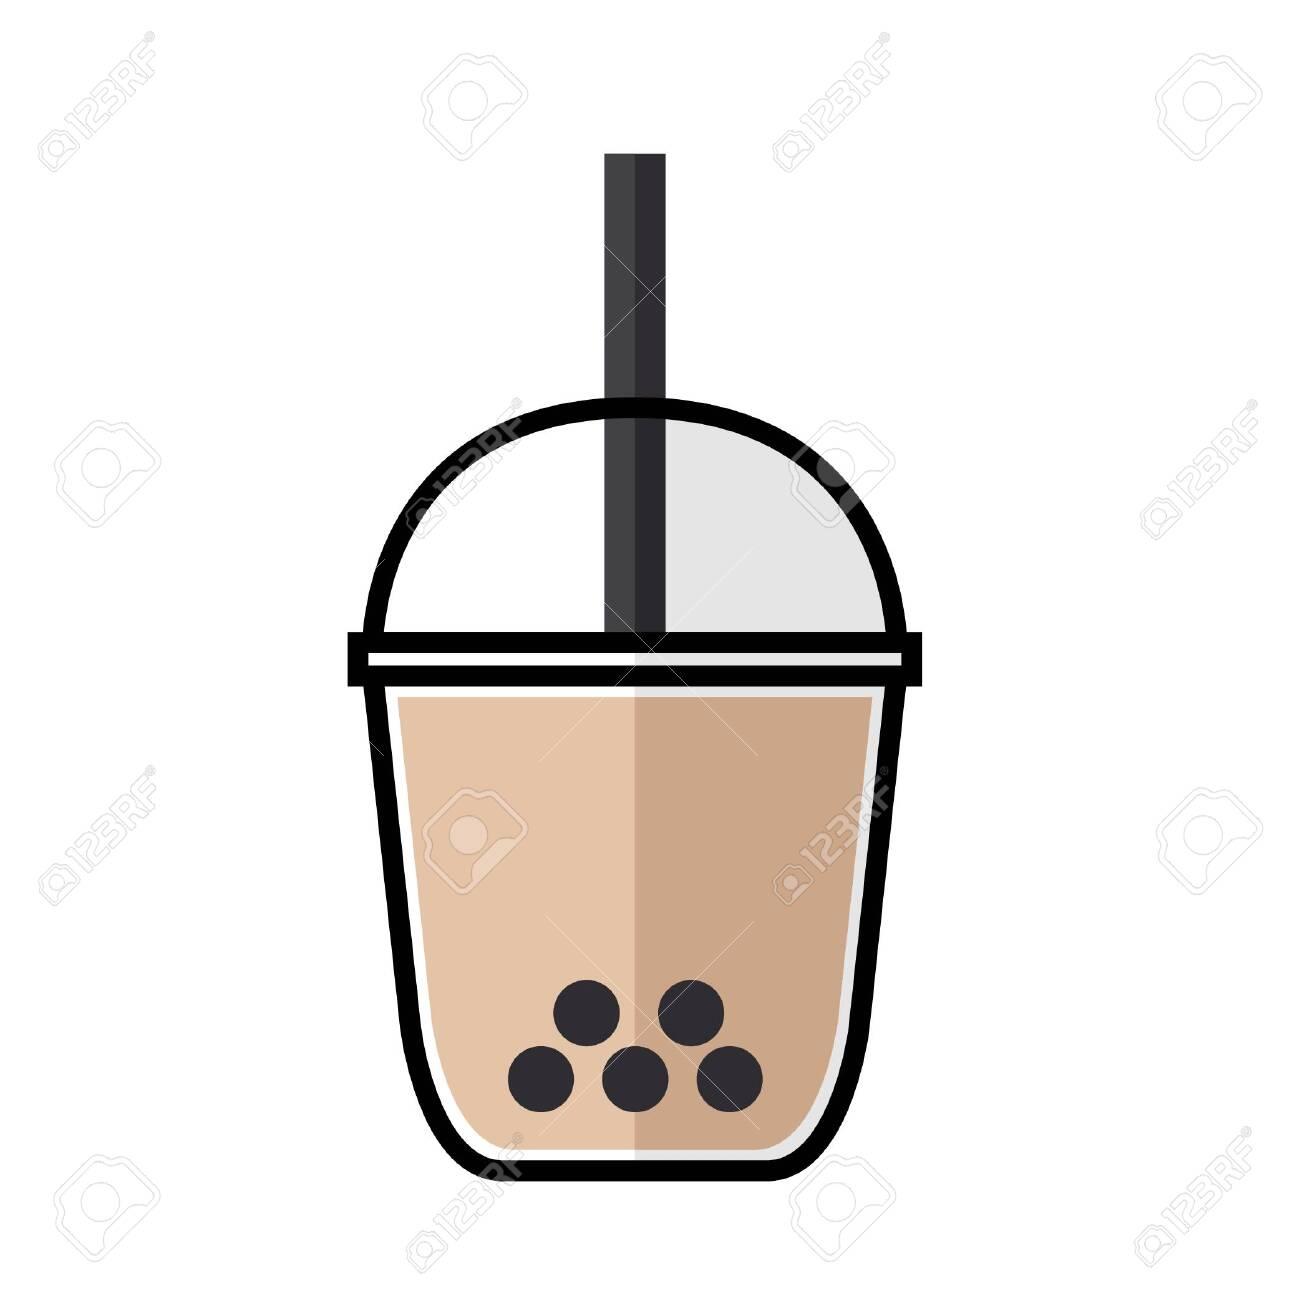 bubble tea flat icon vector royalty free cliparts vectors and stock illustration image 126510489 bubble tea flat icon vector